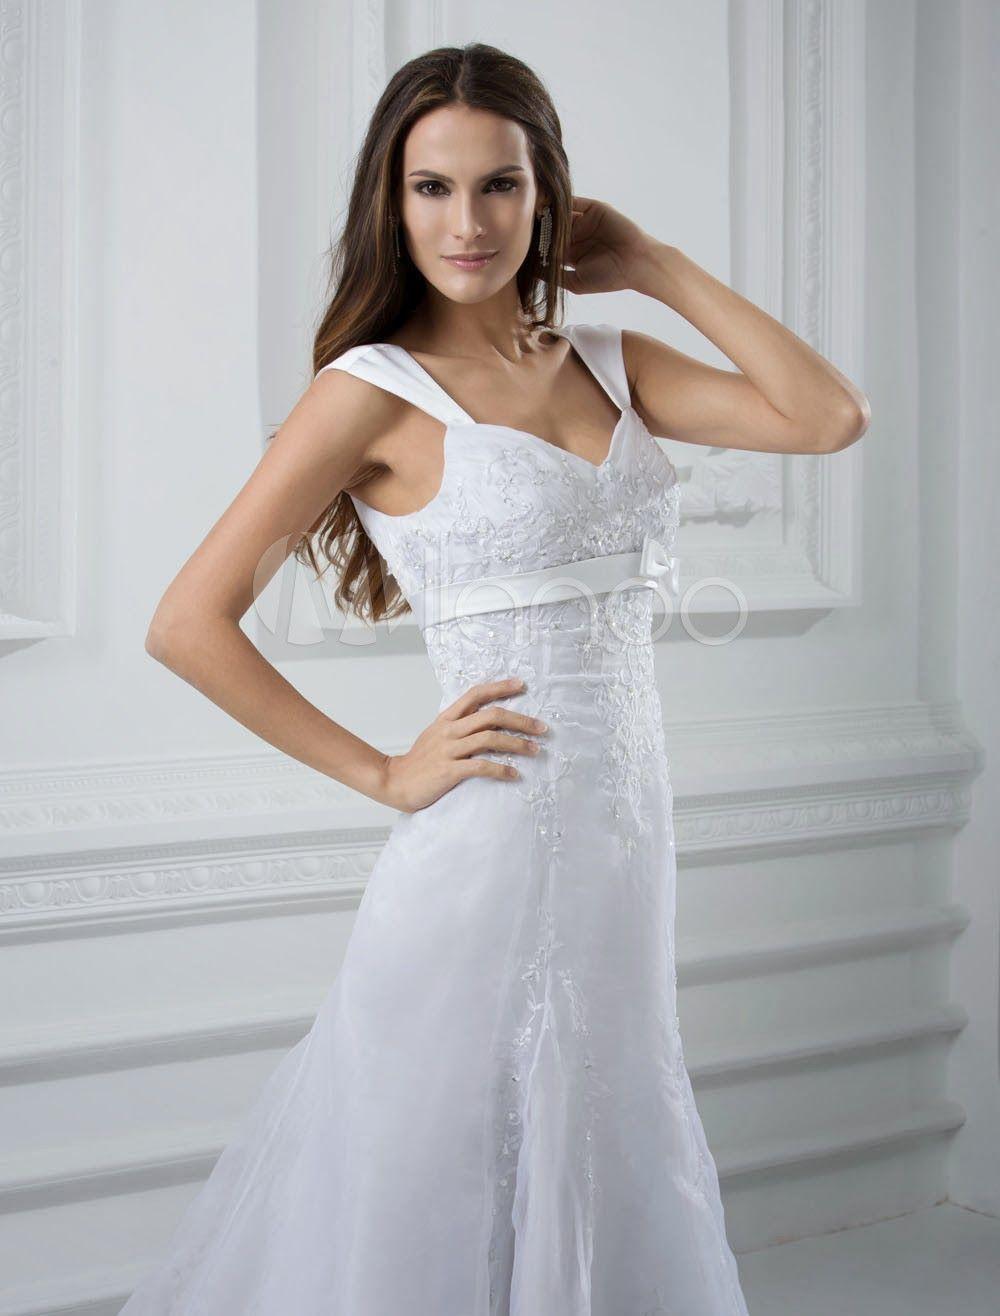 38+ Wholesale wedding dresses near me info